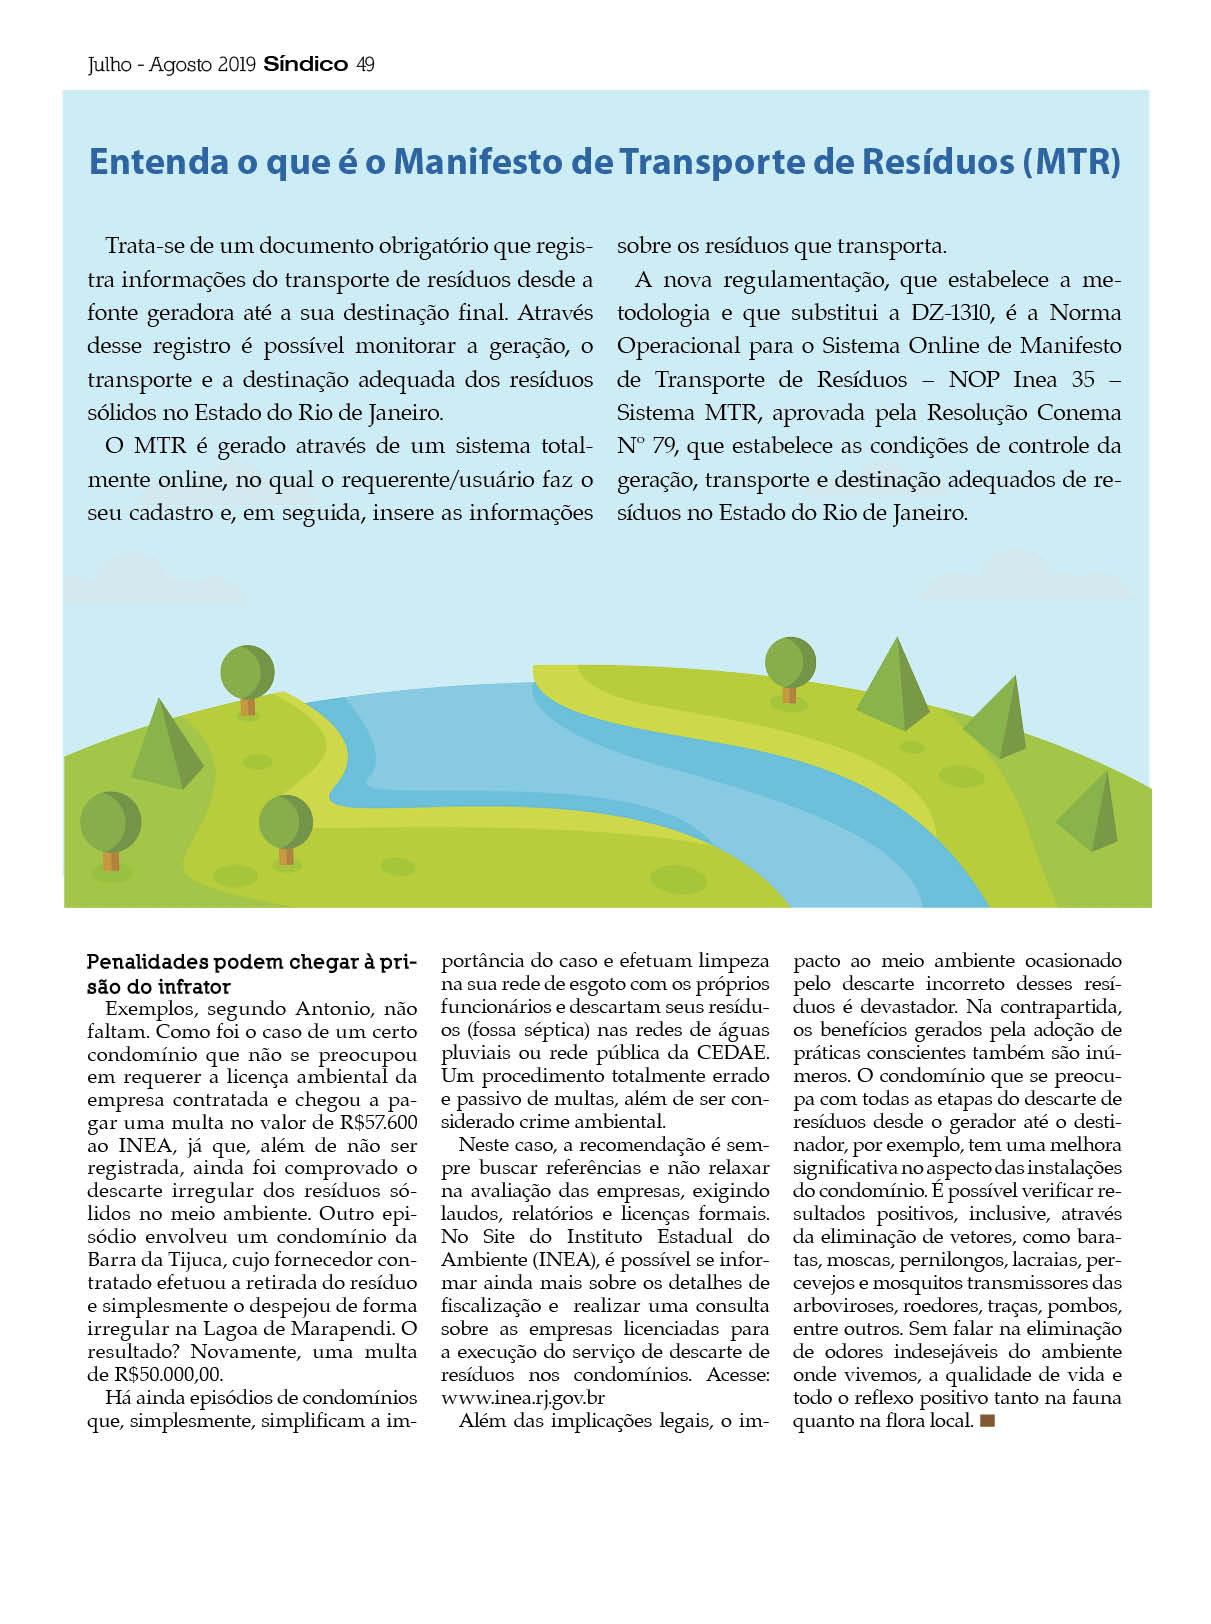 Revista Síndico_ed 24547